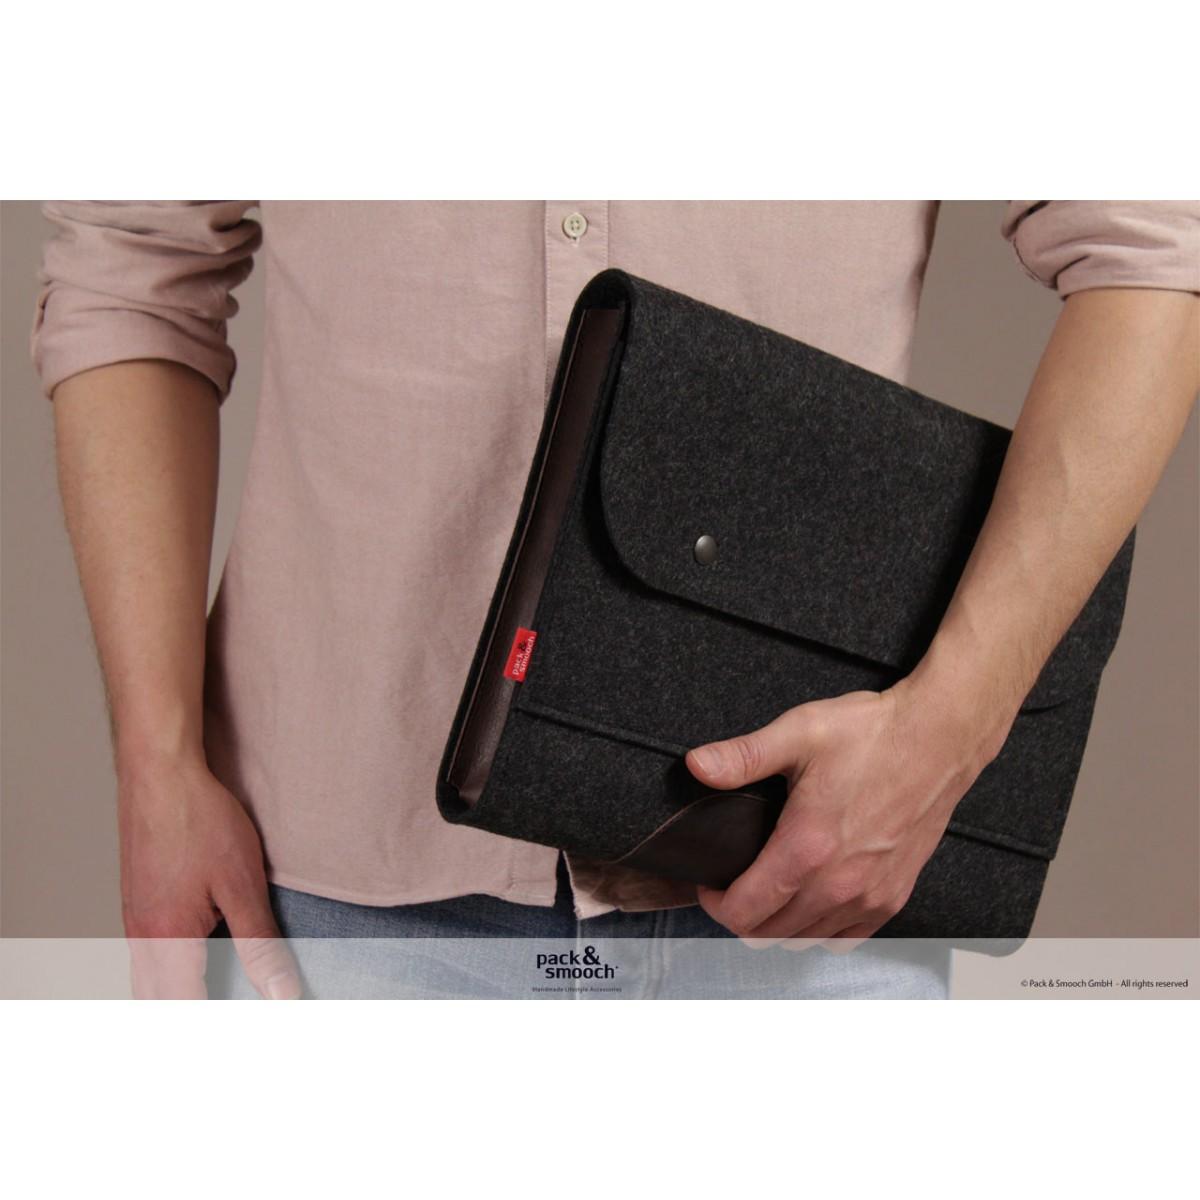 "Pack & Smooch -  iPad/MacBook Tasche ""Corriedale"" 100% Merino Wollfilz (anthrazit)"